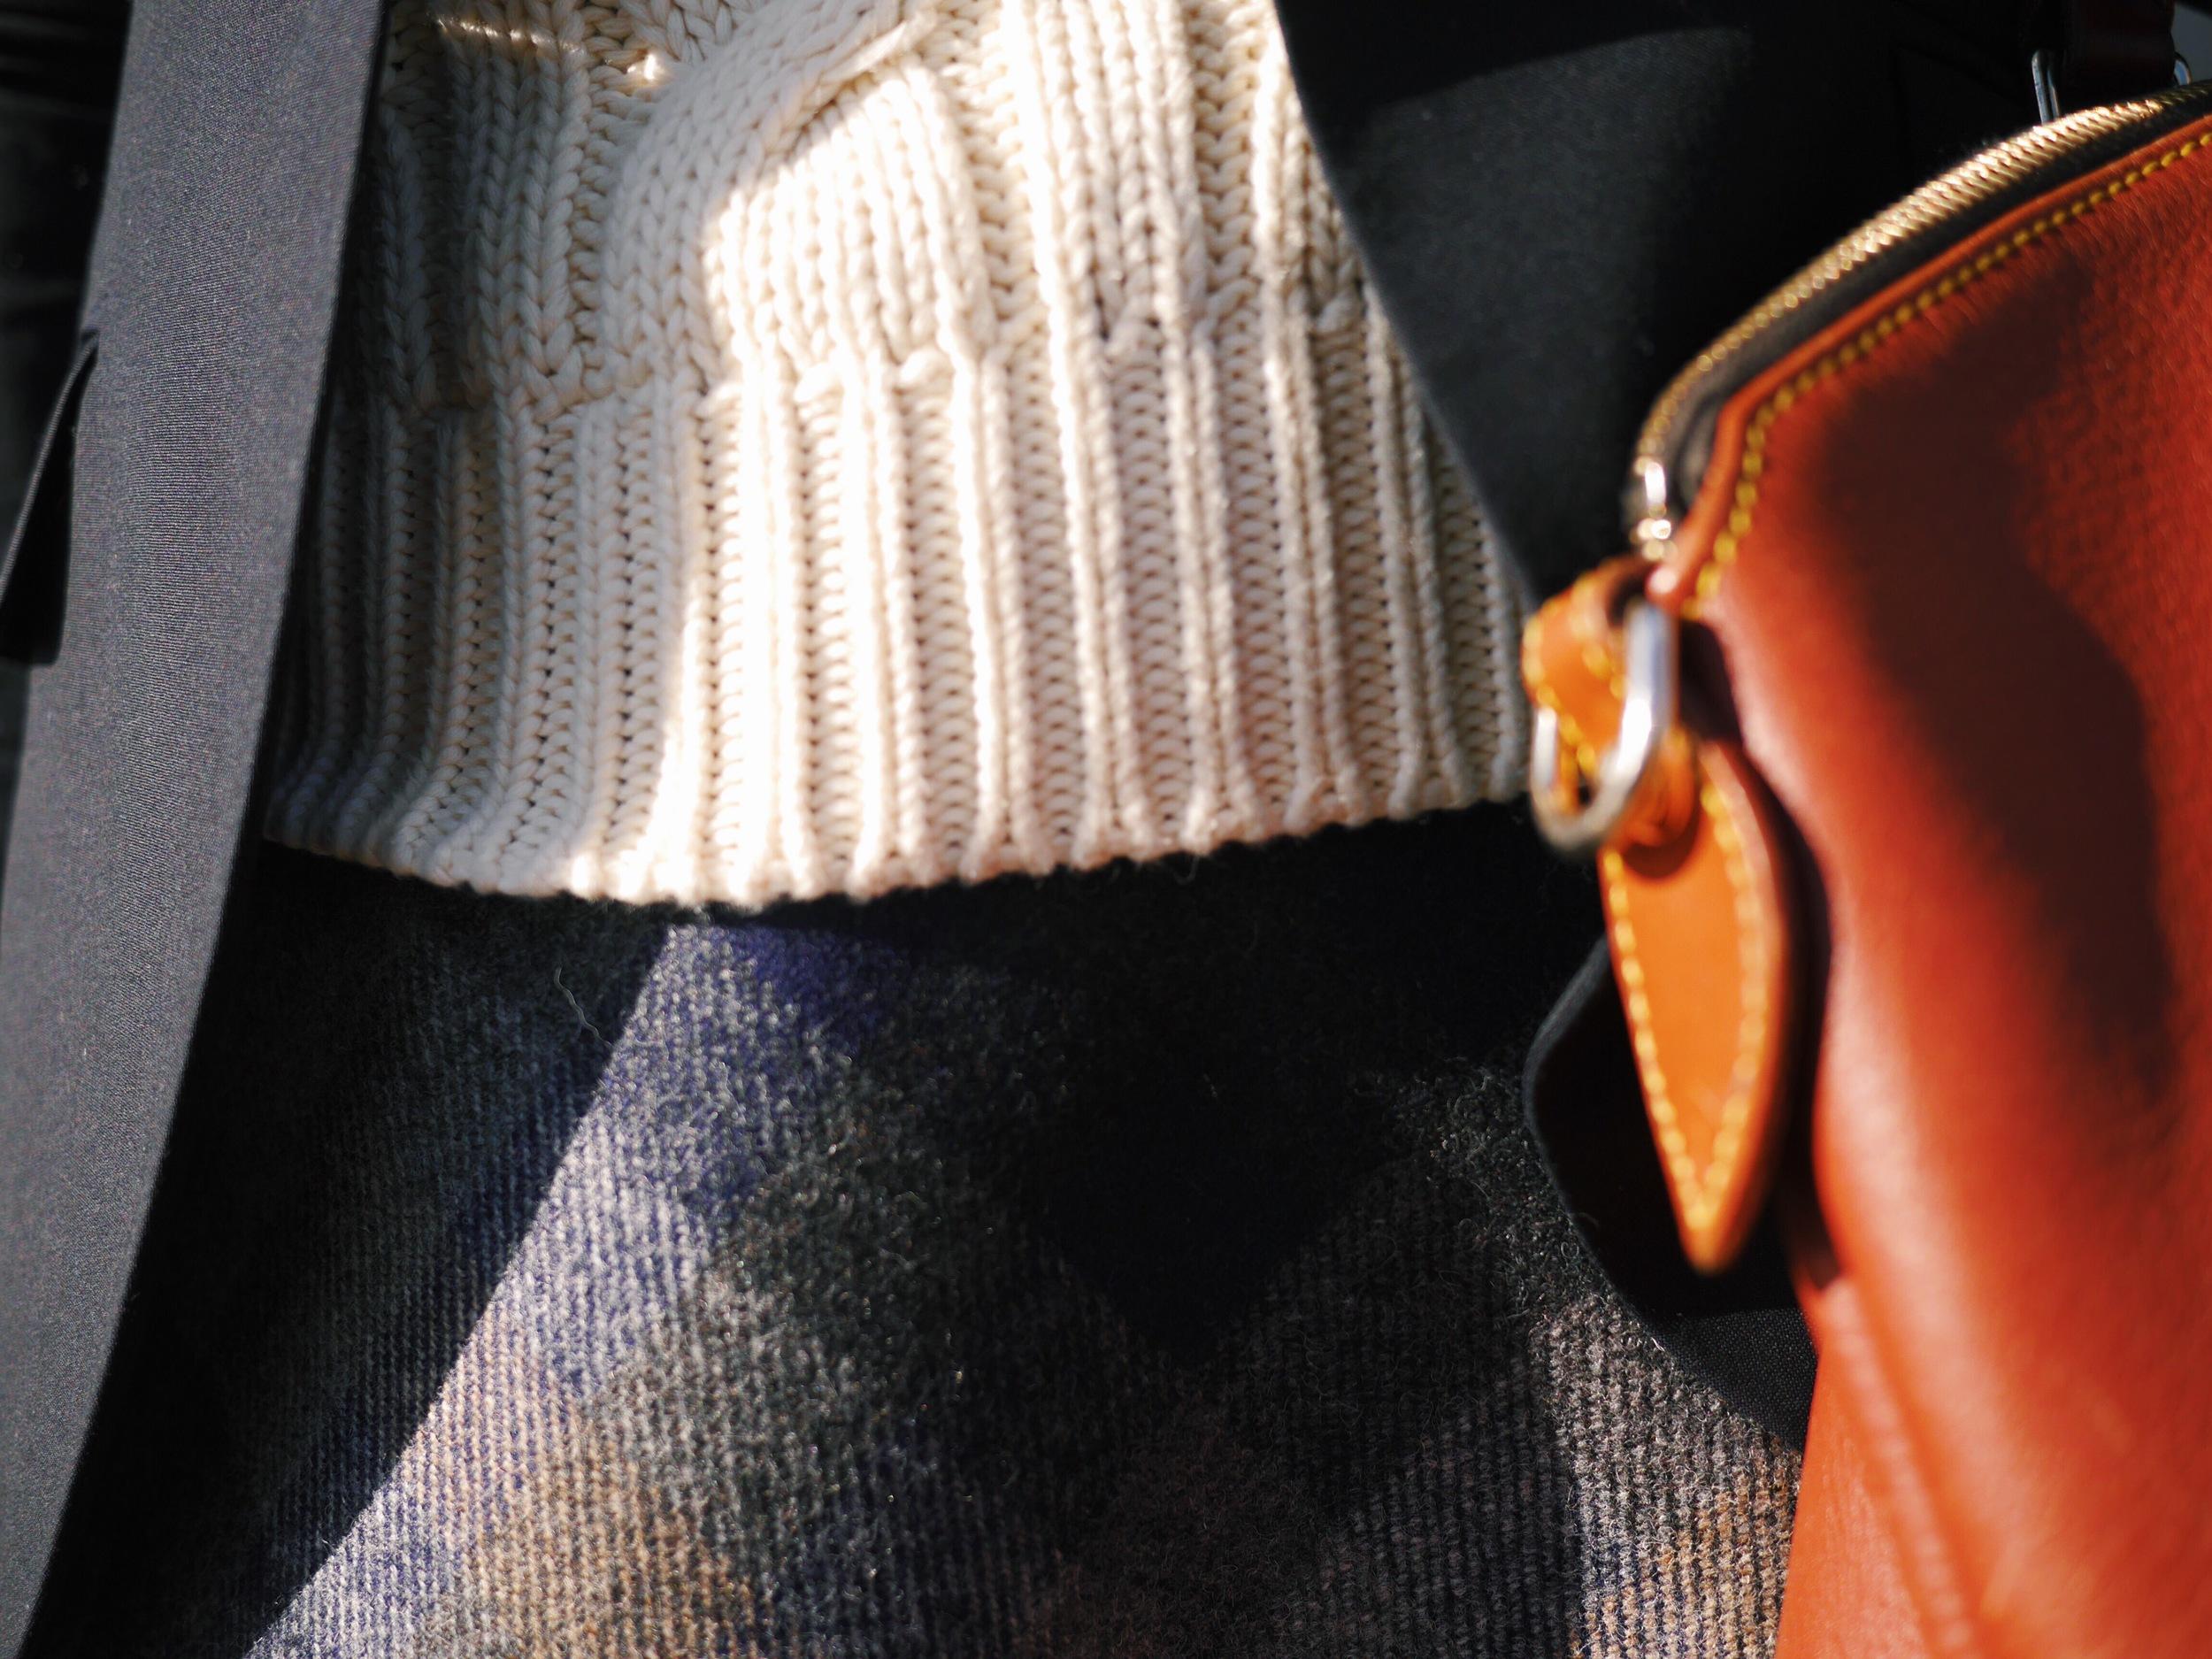 11 Ralph Lauren Cable Knit Turtleneck Brooks Brothers Blue Blazer Brooks Brothers Plaid Skirt Ralph Lauren Riding Boots J Crew Chambray Shirt..jpeg